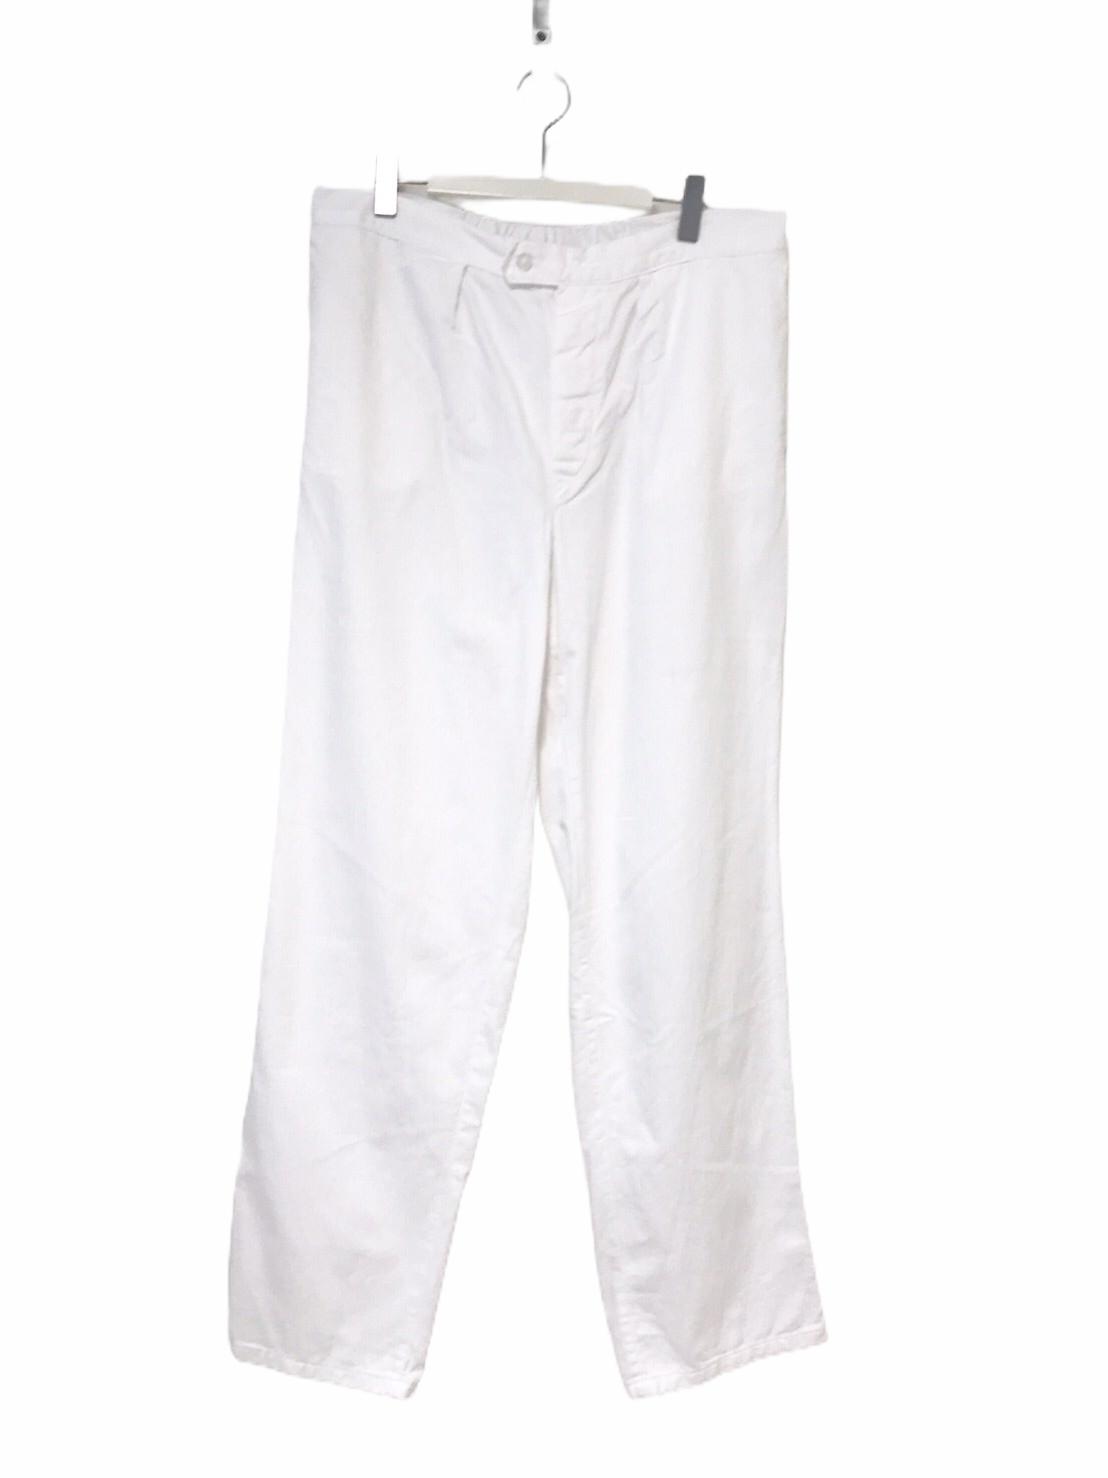 """Dead Stock"" Czech Army Pants White"